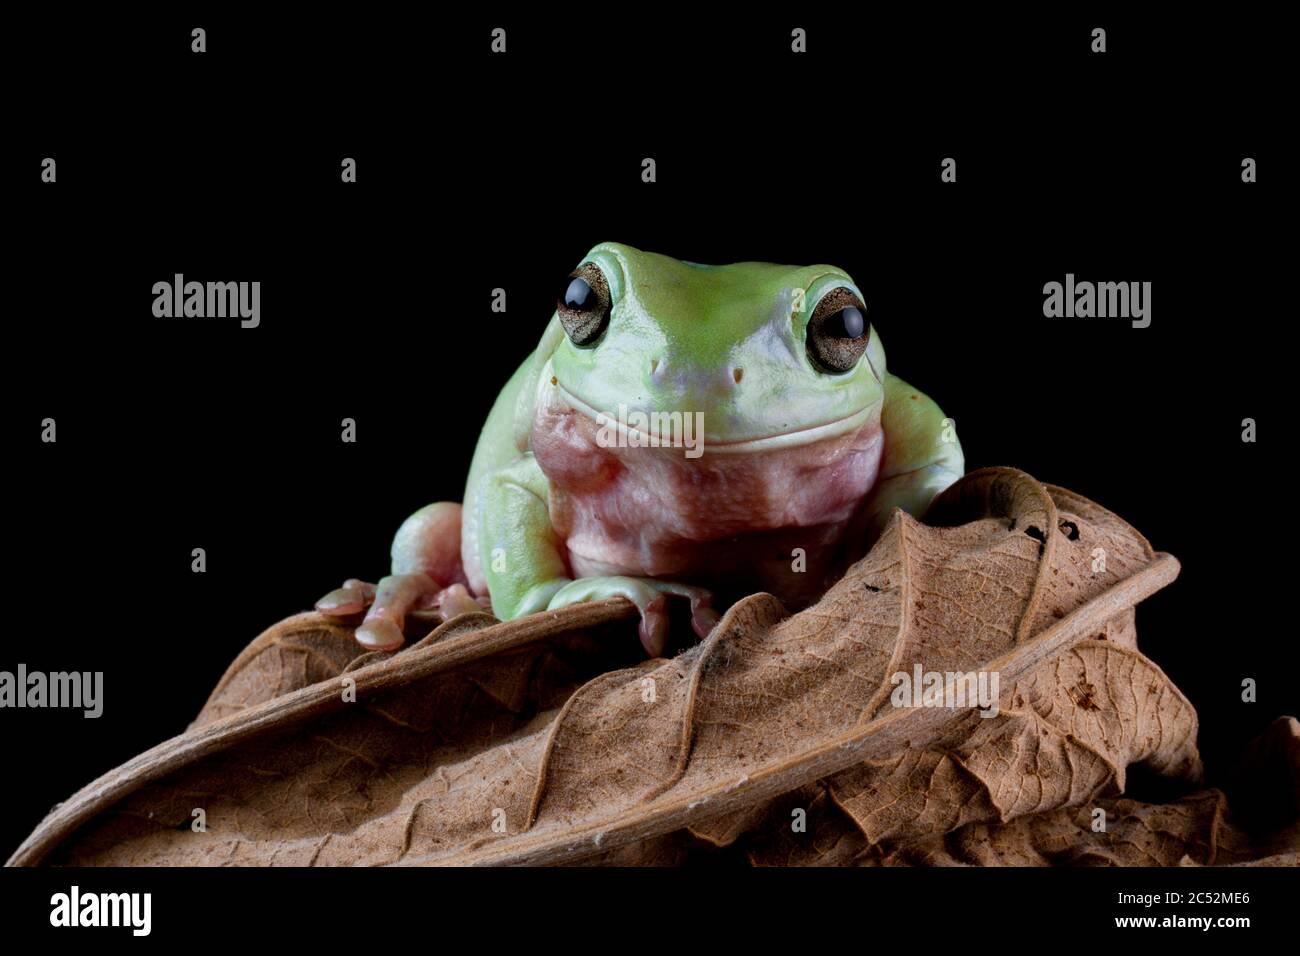 Australian Tree frog sitting on a leaf, Indonesia Stock Photo